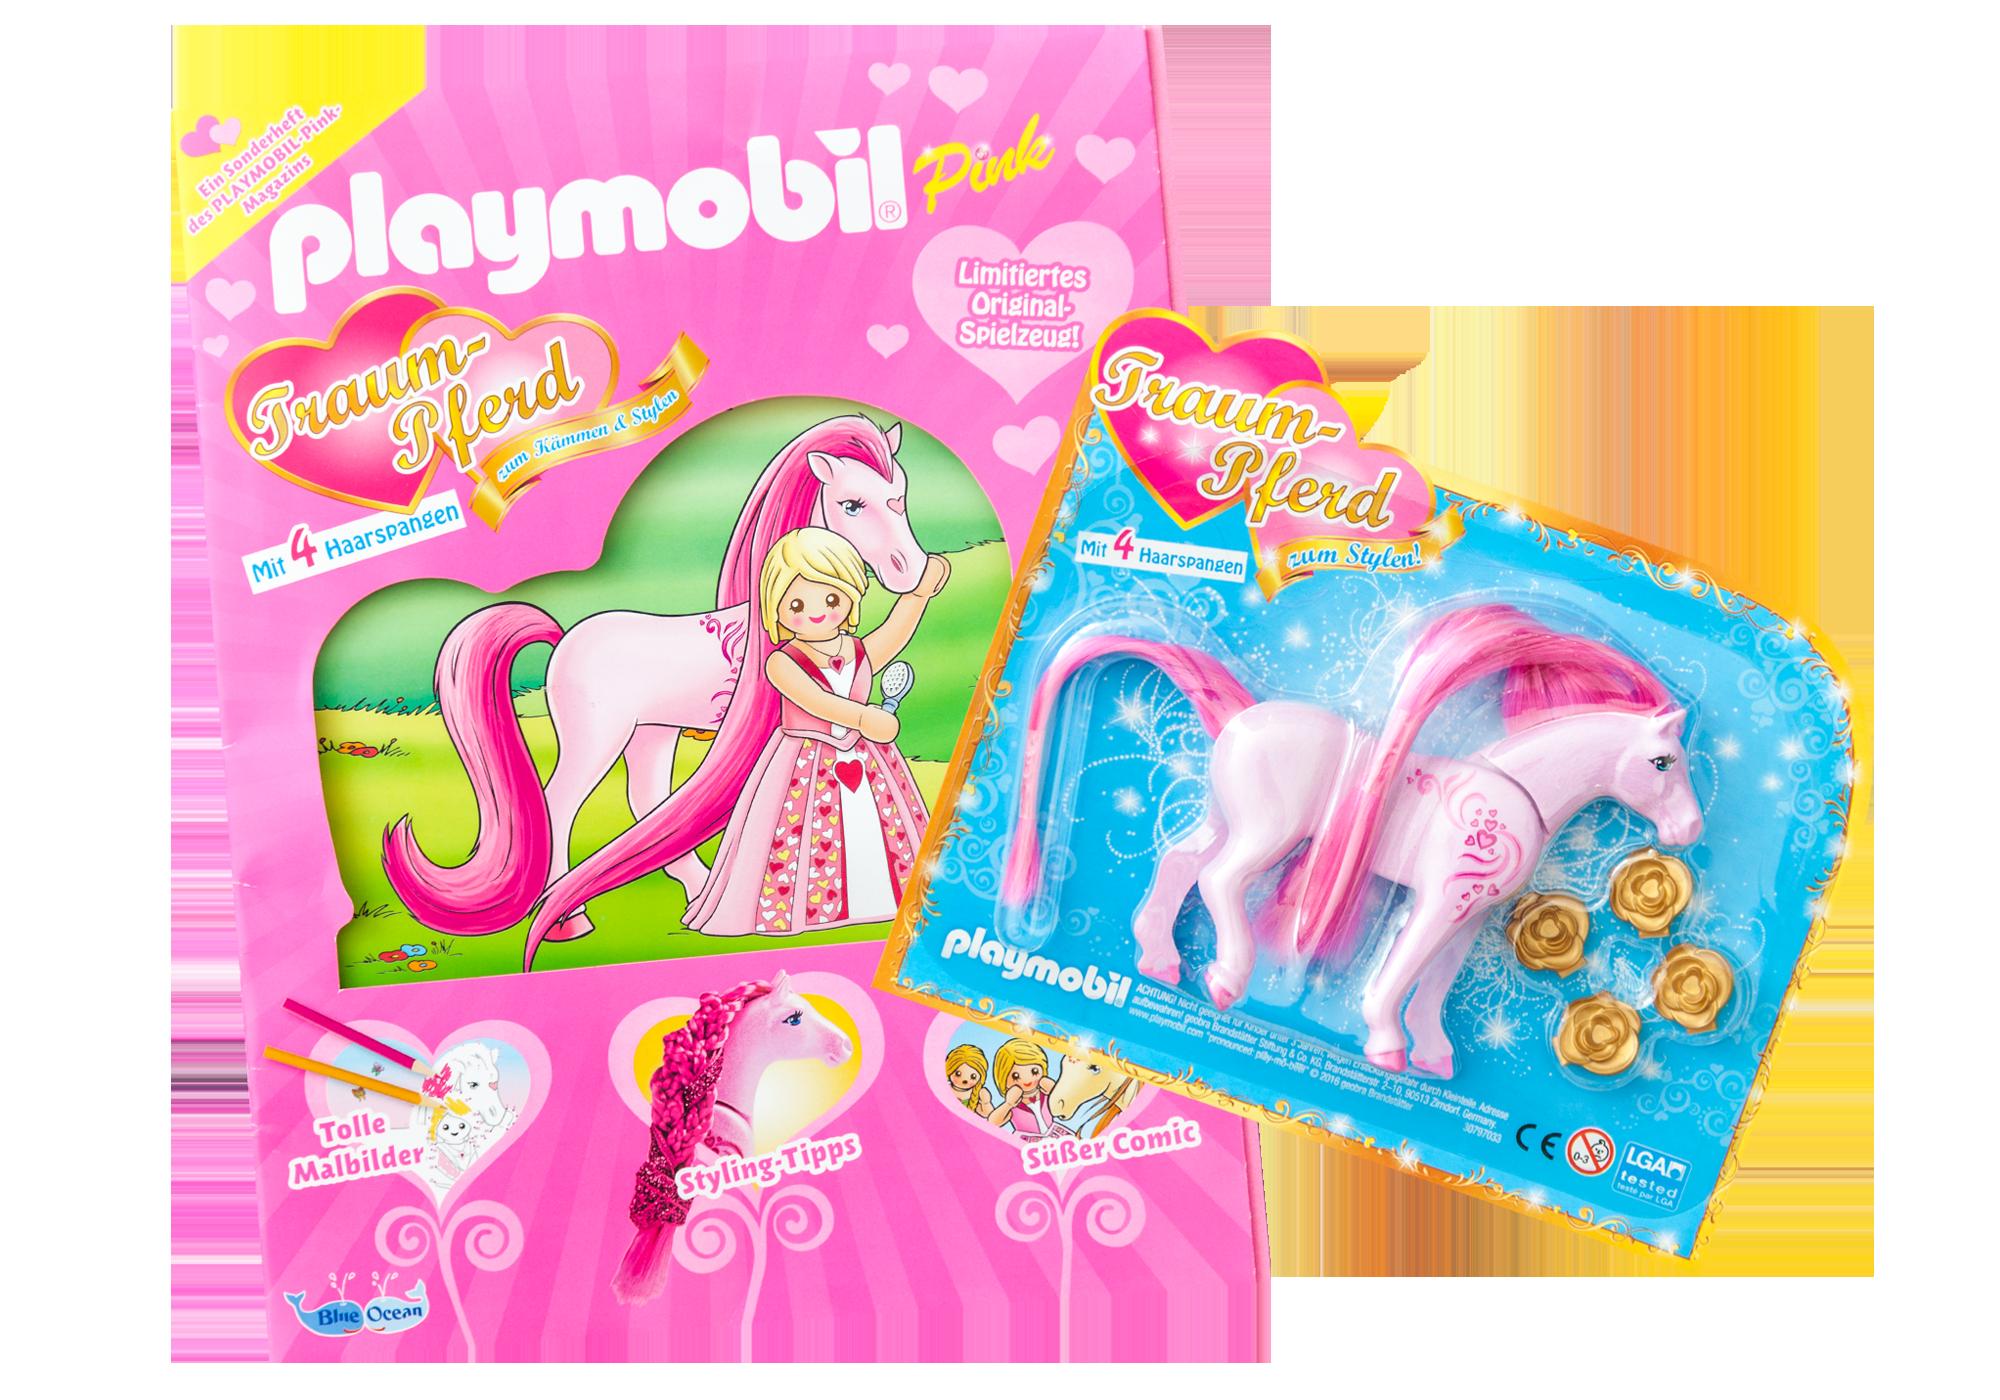 http://media.playmobil.com/i/playmobil/80576_product_detail/PLAYMOBIL-Magazin Pink Sonderheft 2016